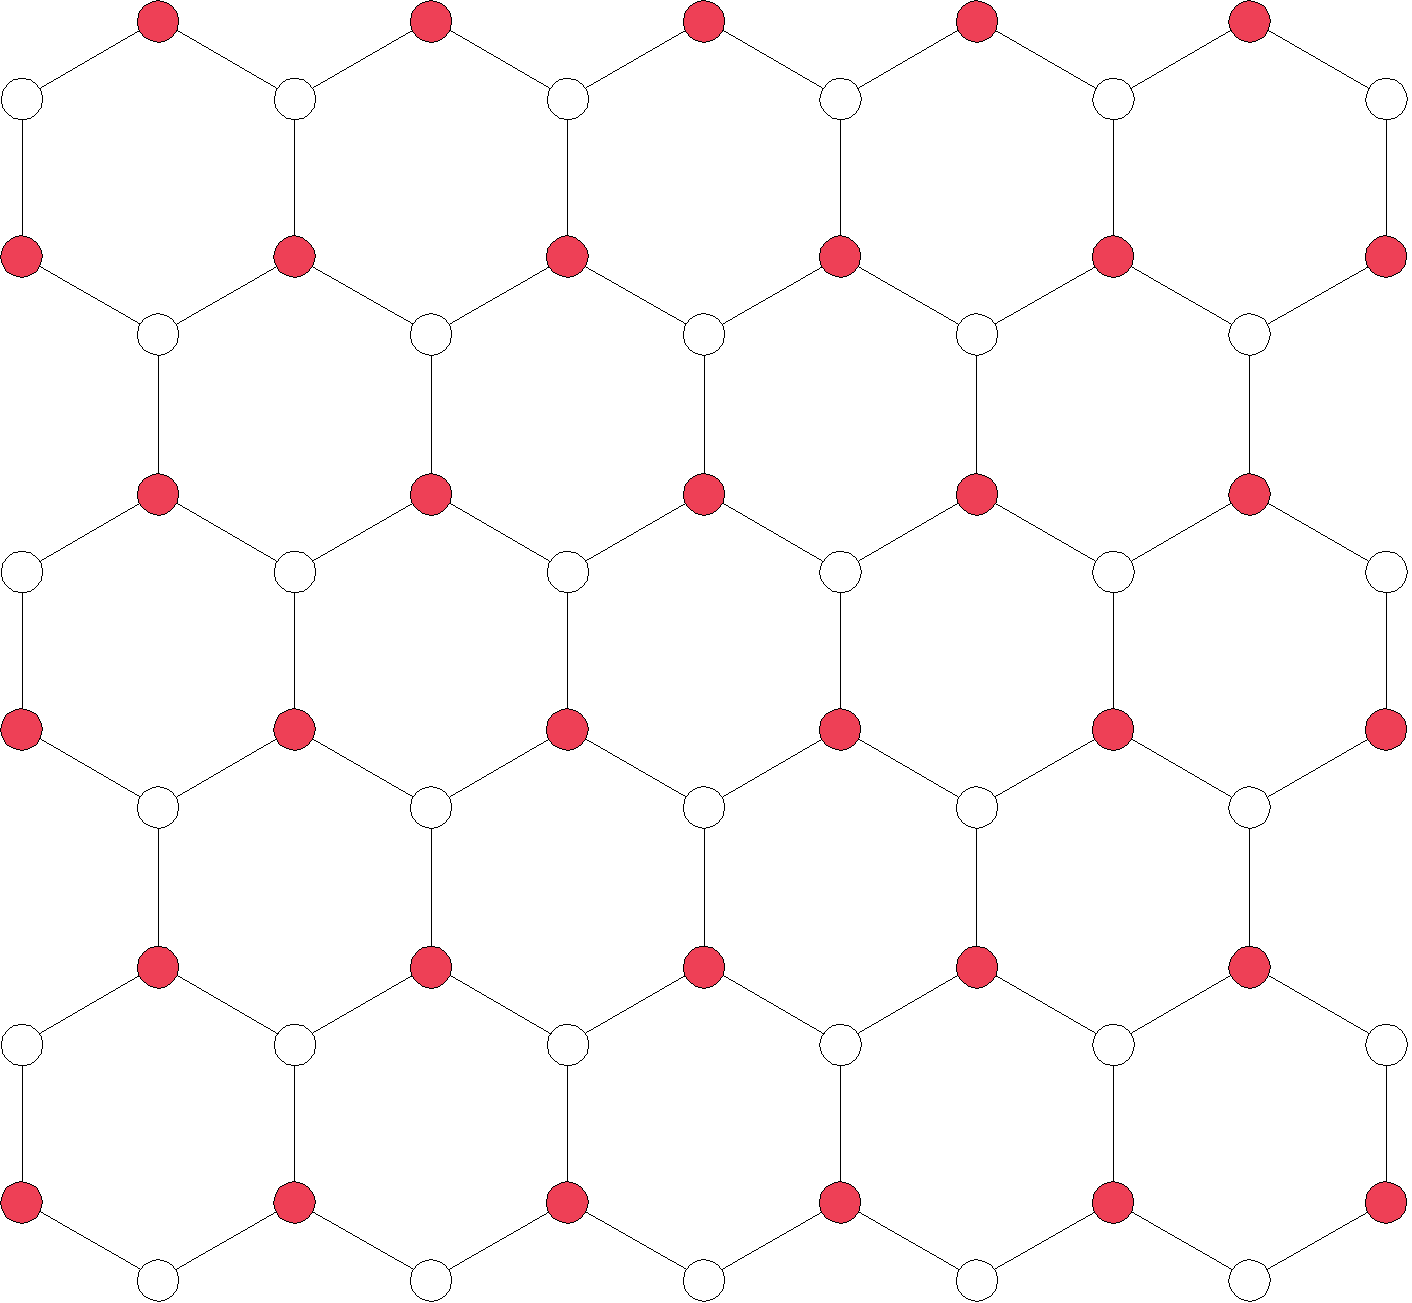 graphene-lattice.png